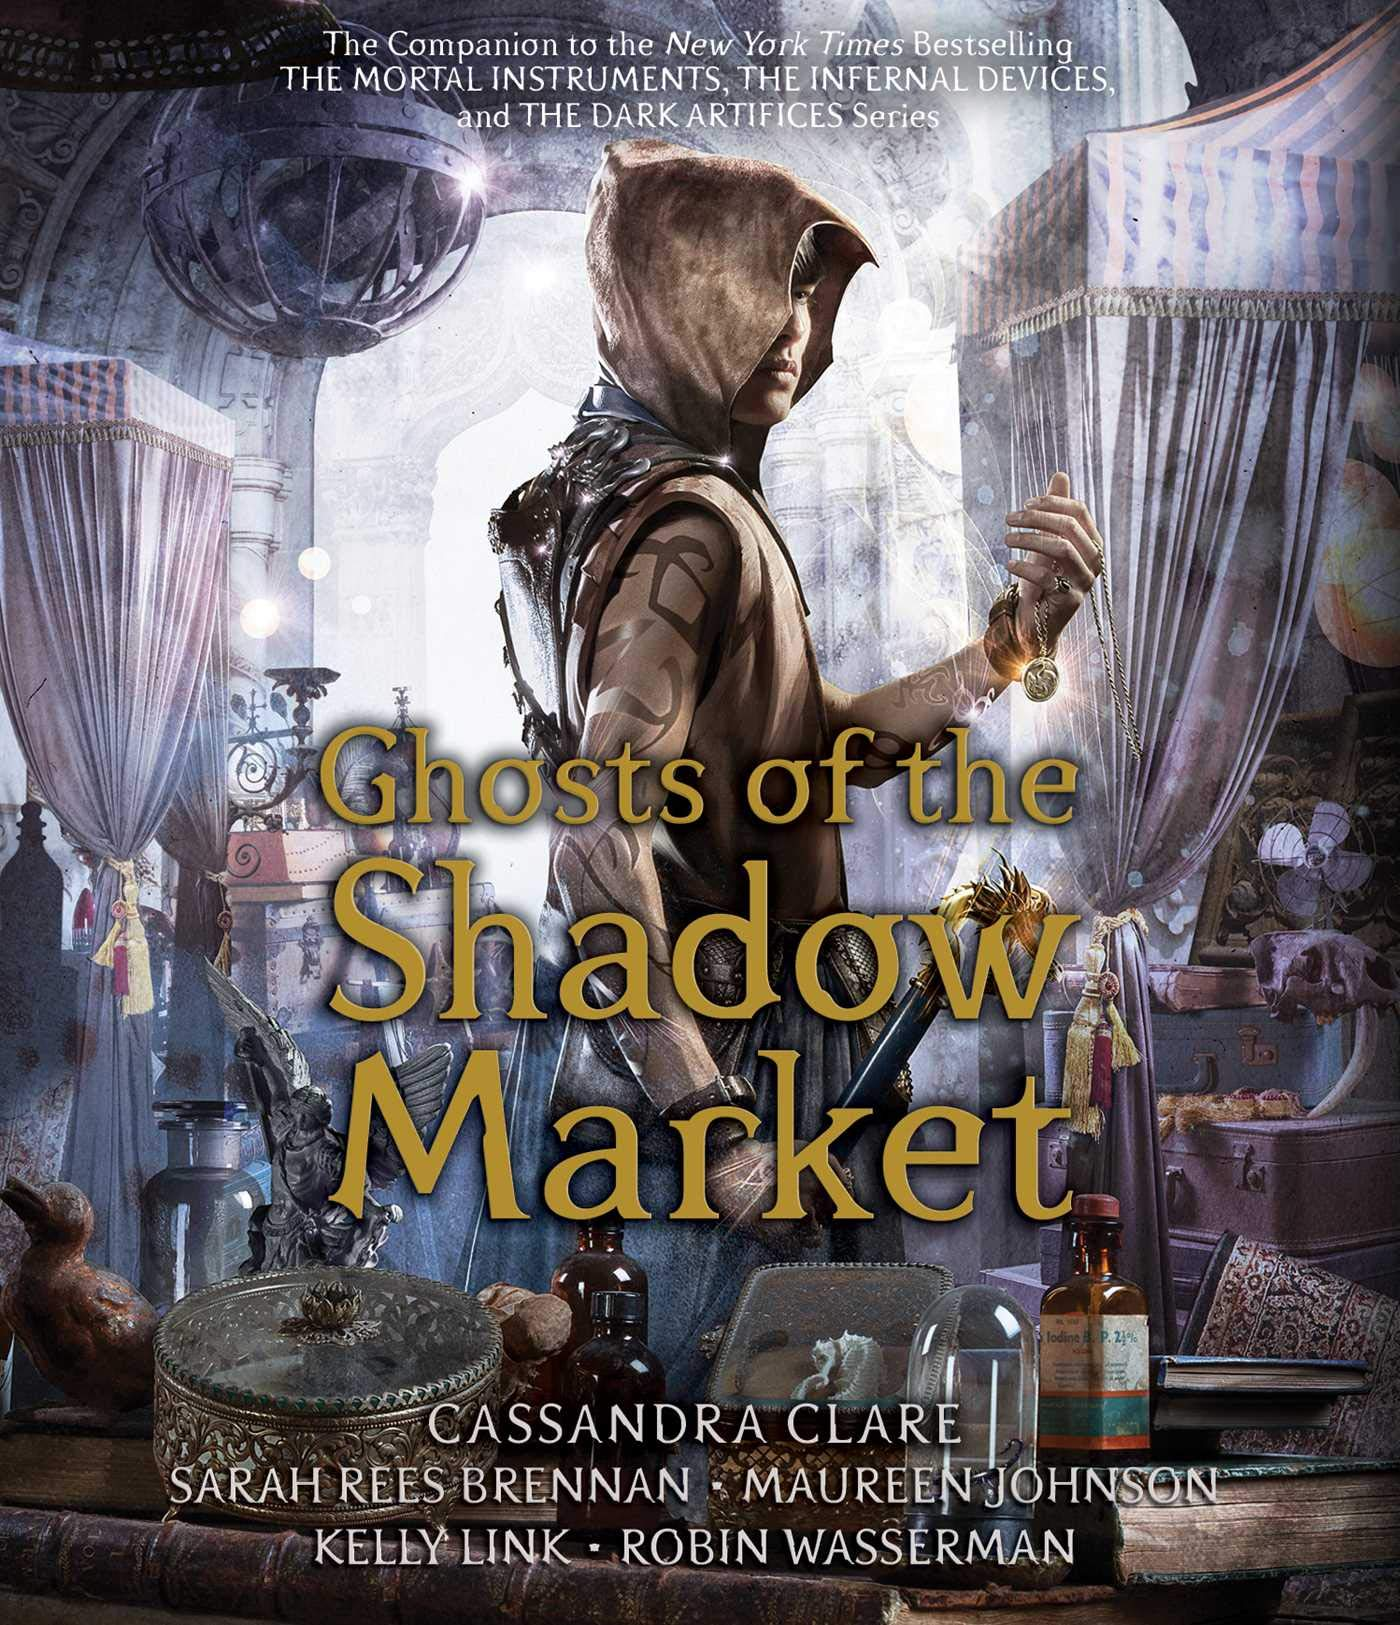 Ghosts of the Shadow Market: Amazon.es: Cassandra Clare, Sarah Rees  Brennan, Maureen Johnson: Libros en idiomas extranjeros